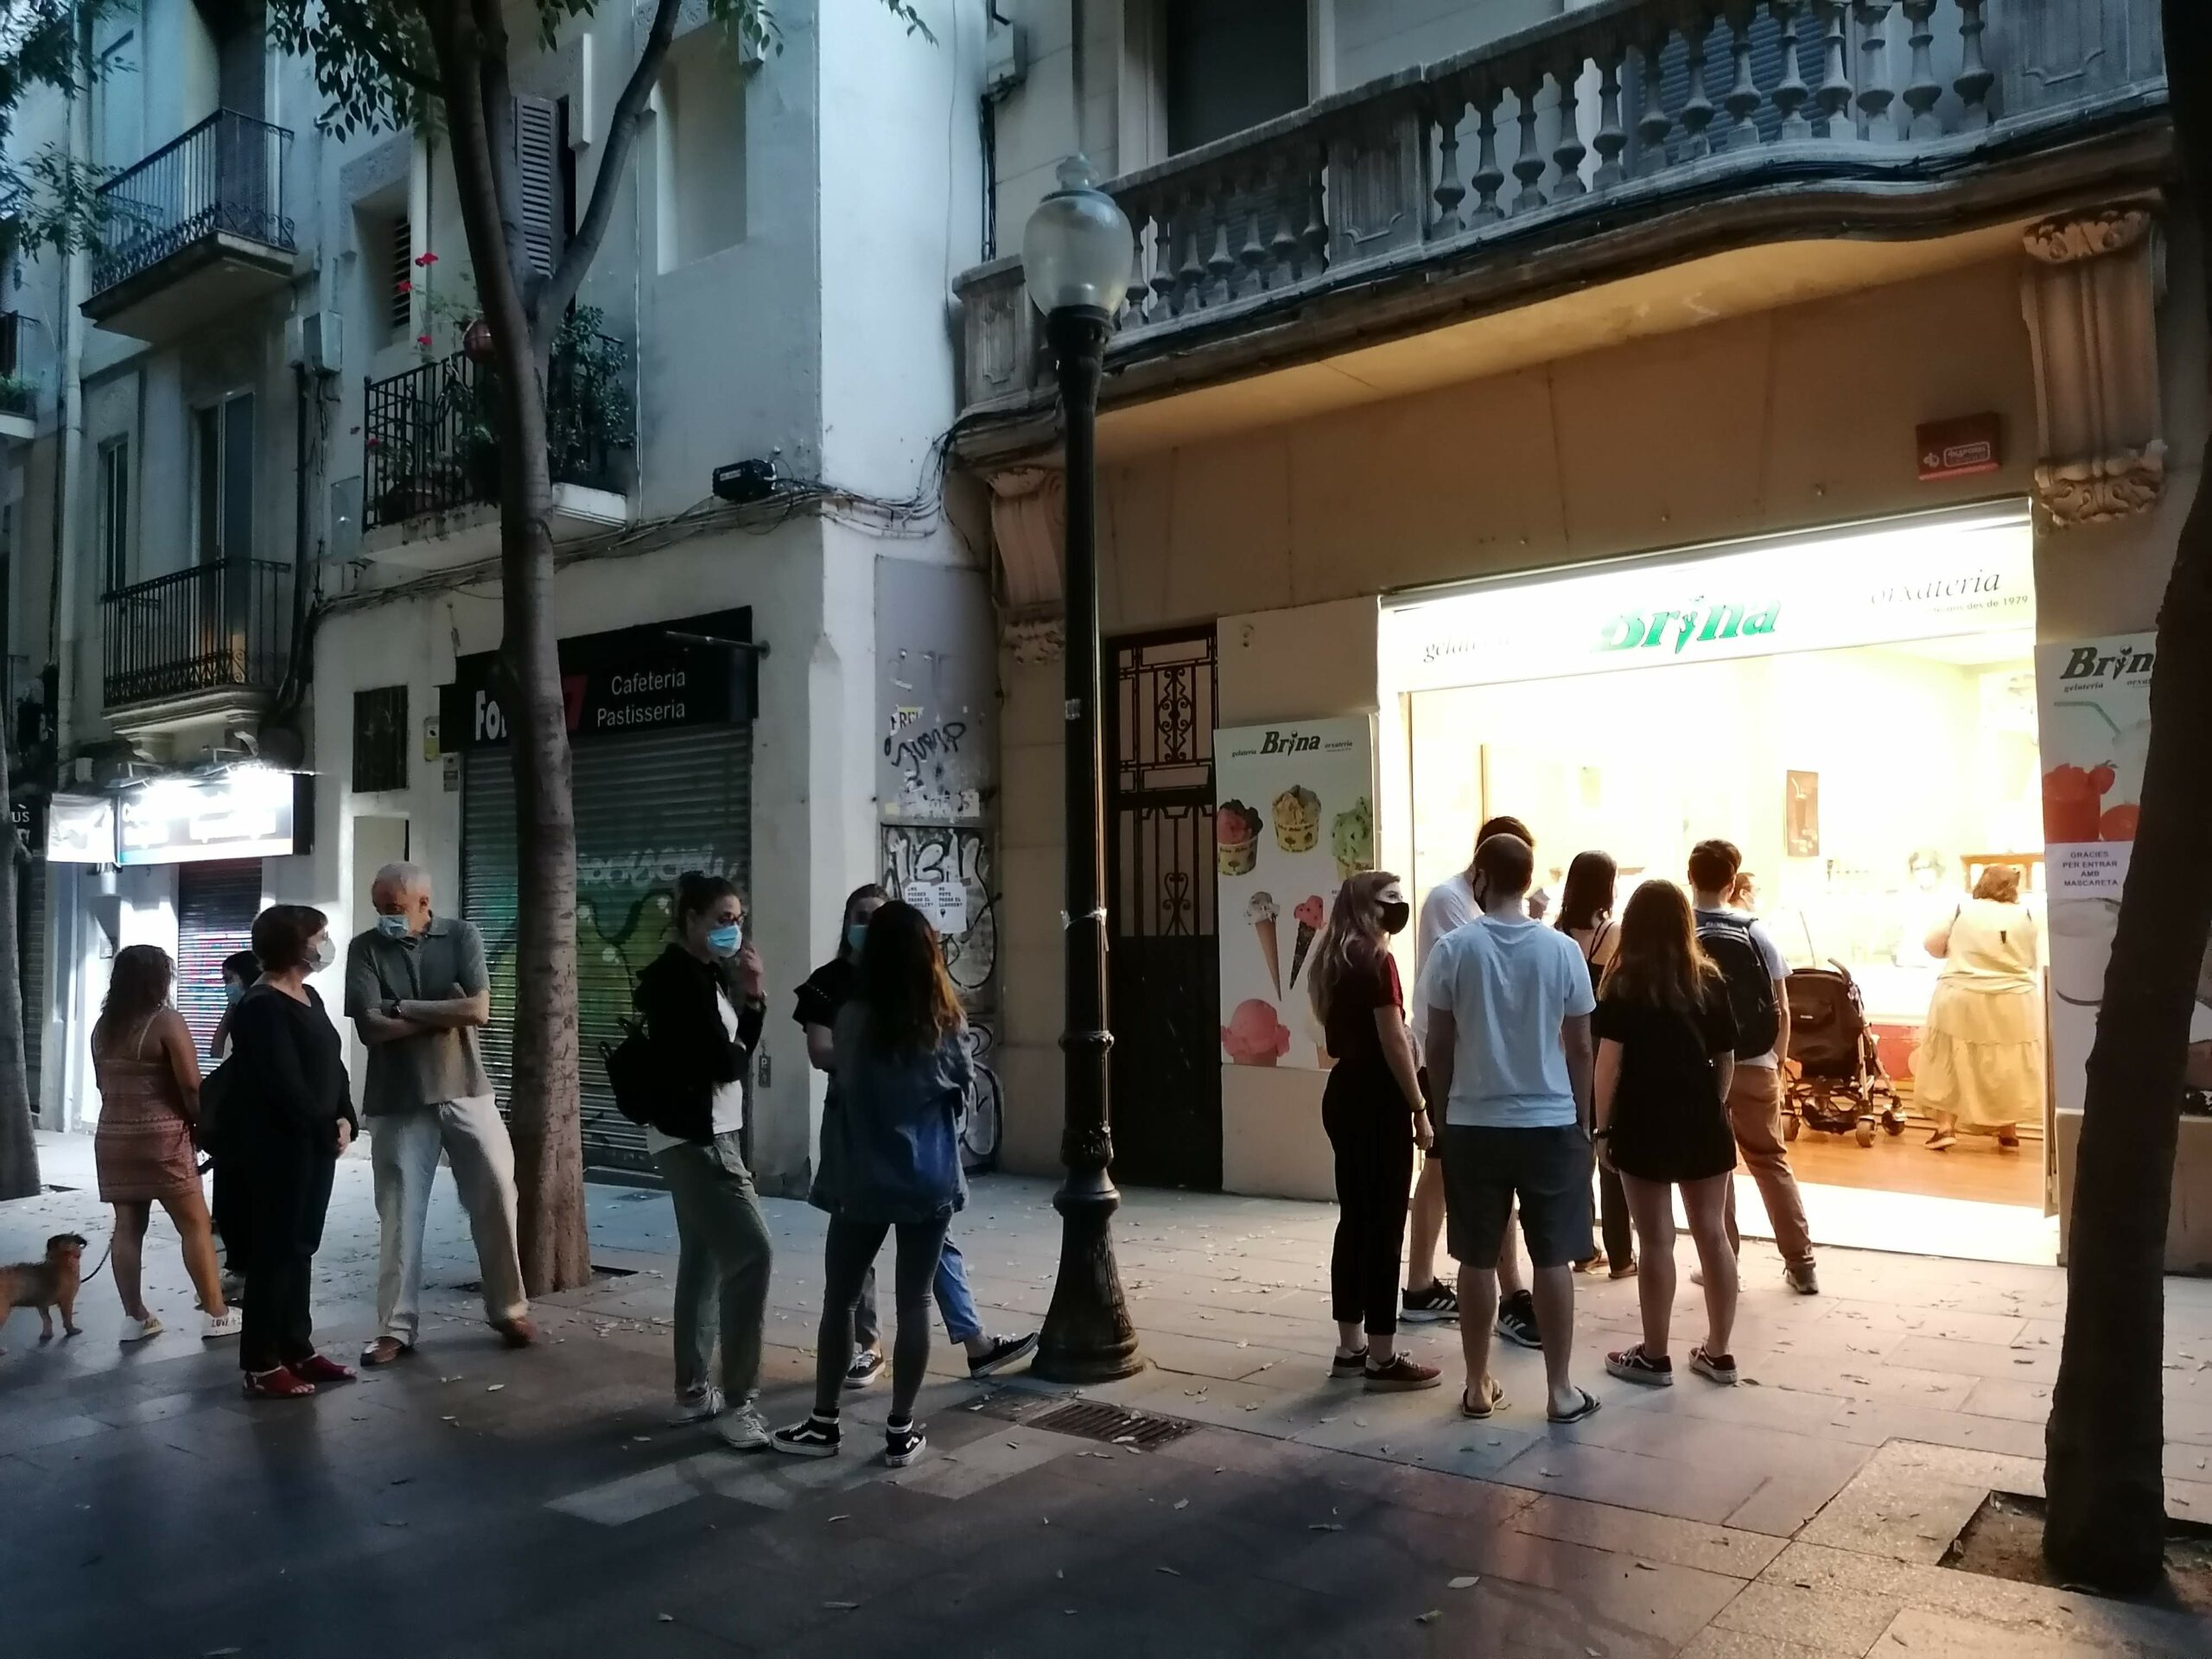 Cua a la gelateria Brina de Barcelona / MMP